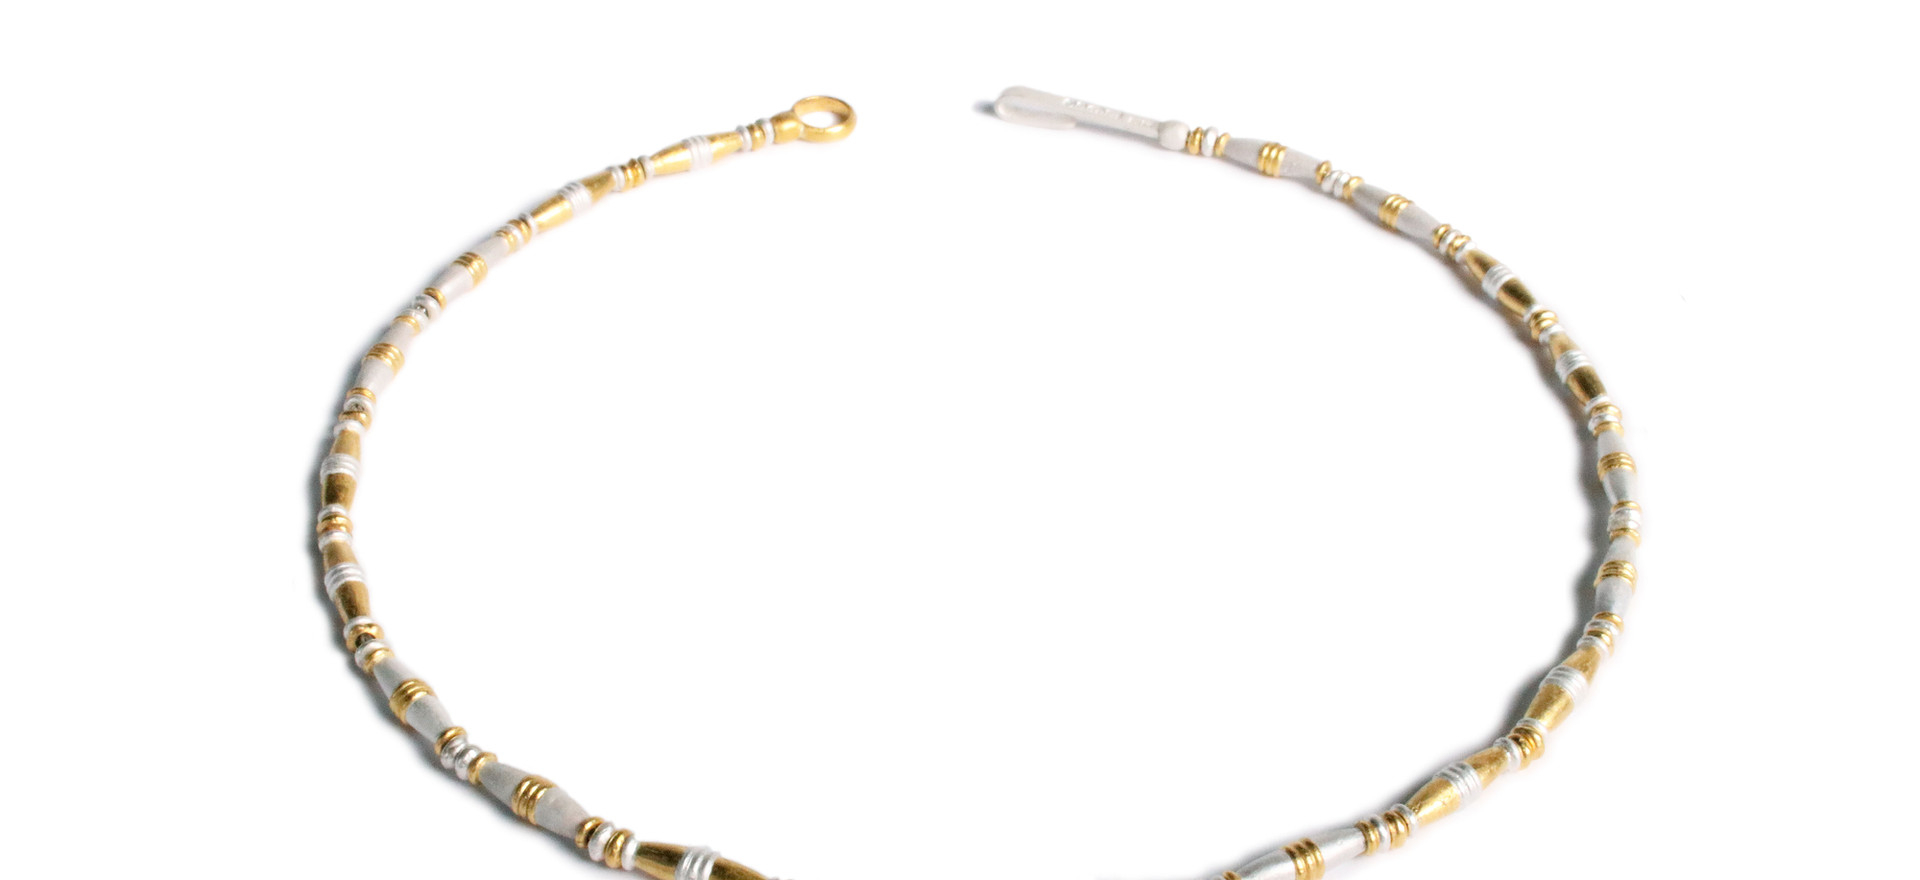 Almond necklace